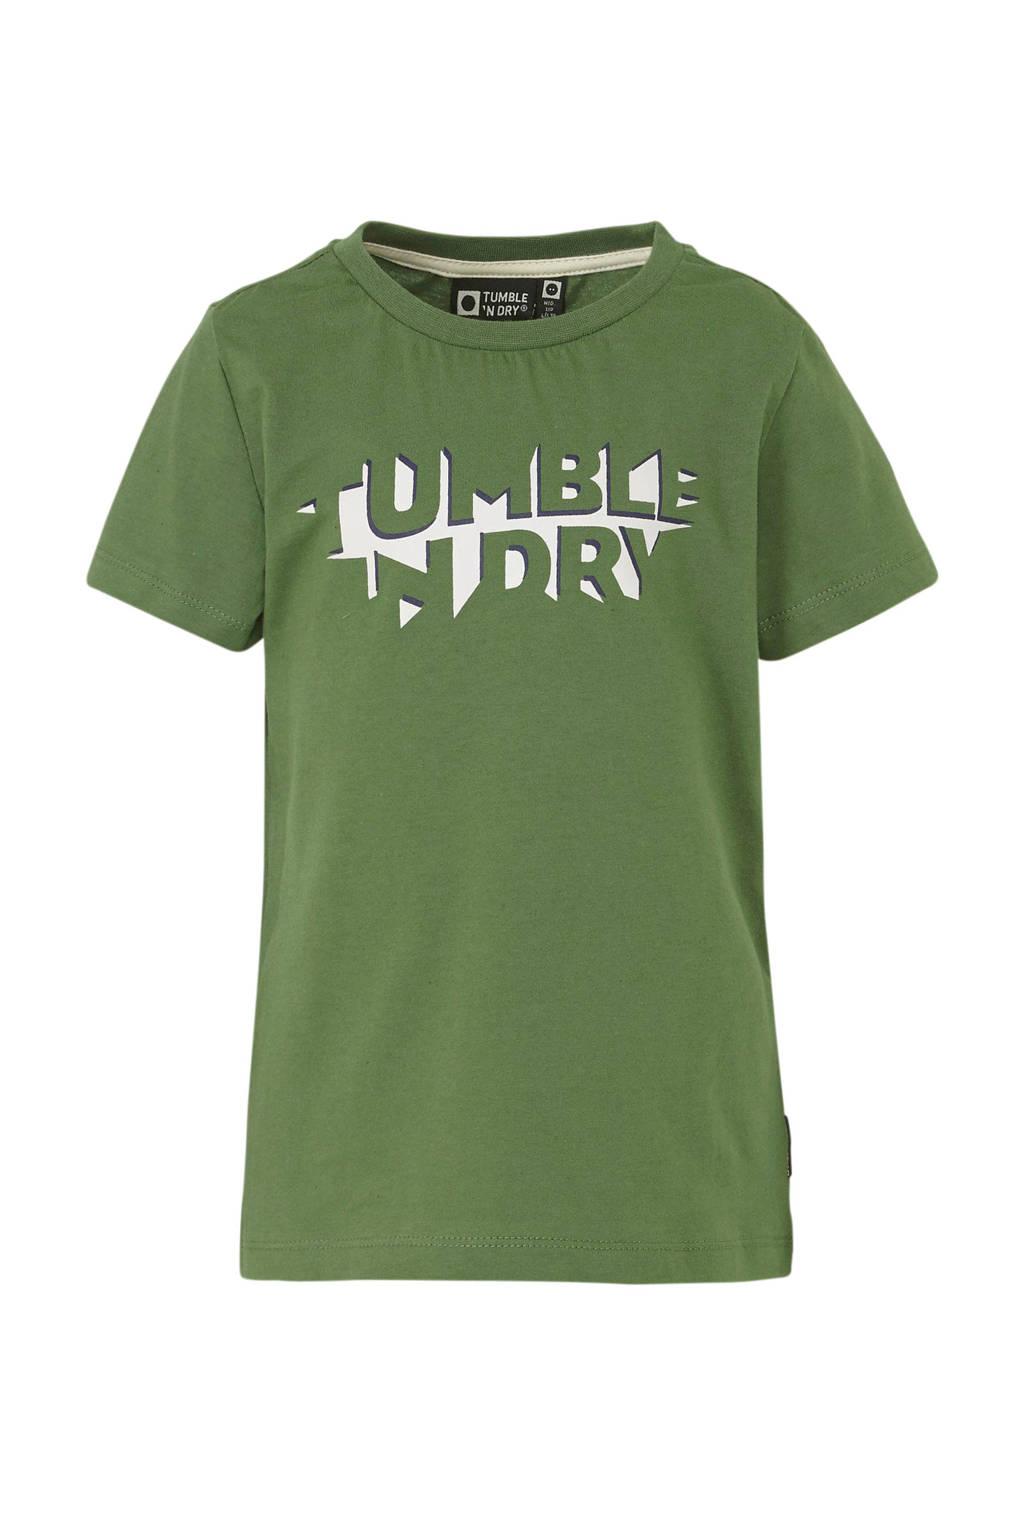 Tumble 'n Dry Mid regular fit T-shirt Gus met logo groen/wit/donkerblauw, Groen/wit/donkerblauw